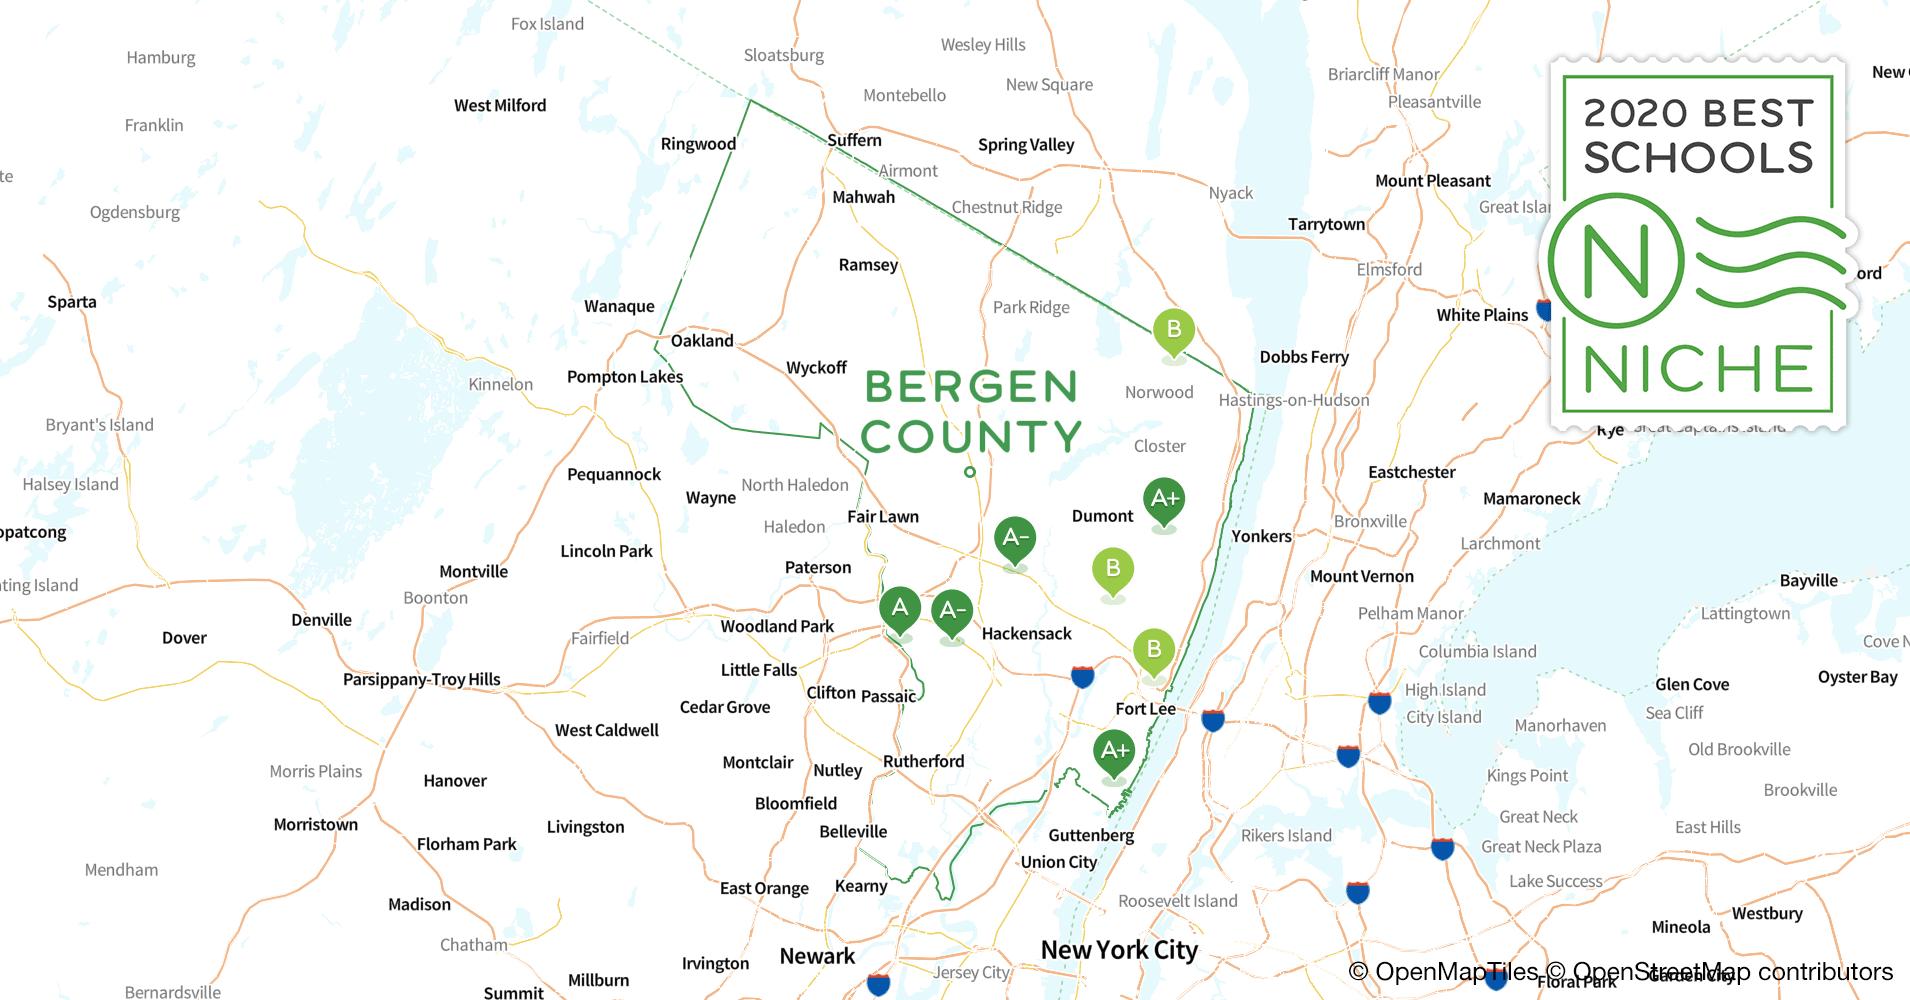 School Districts In Bergen County Nj Niche